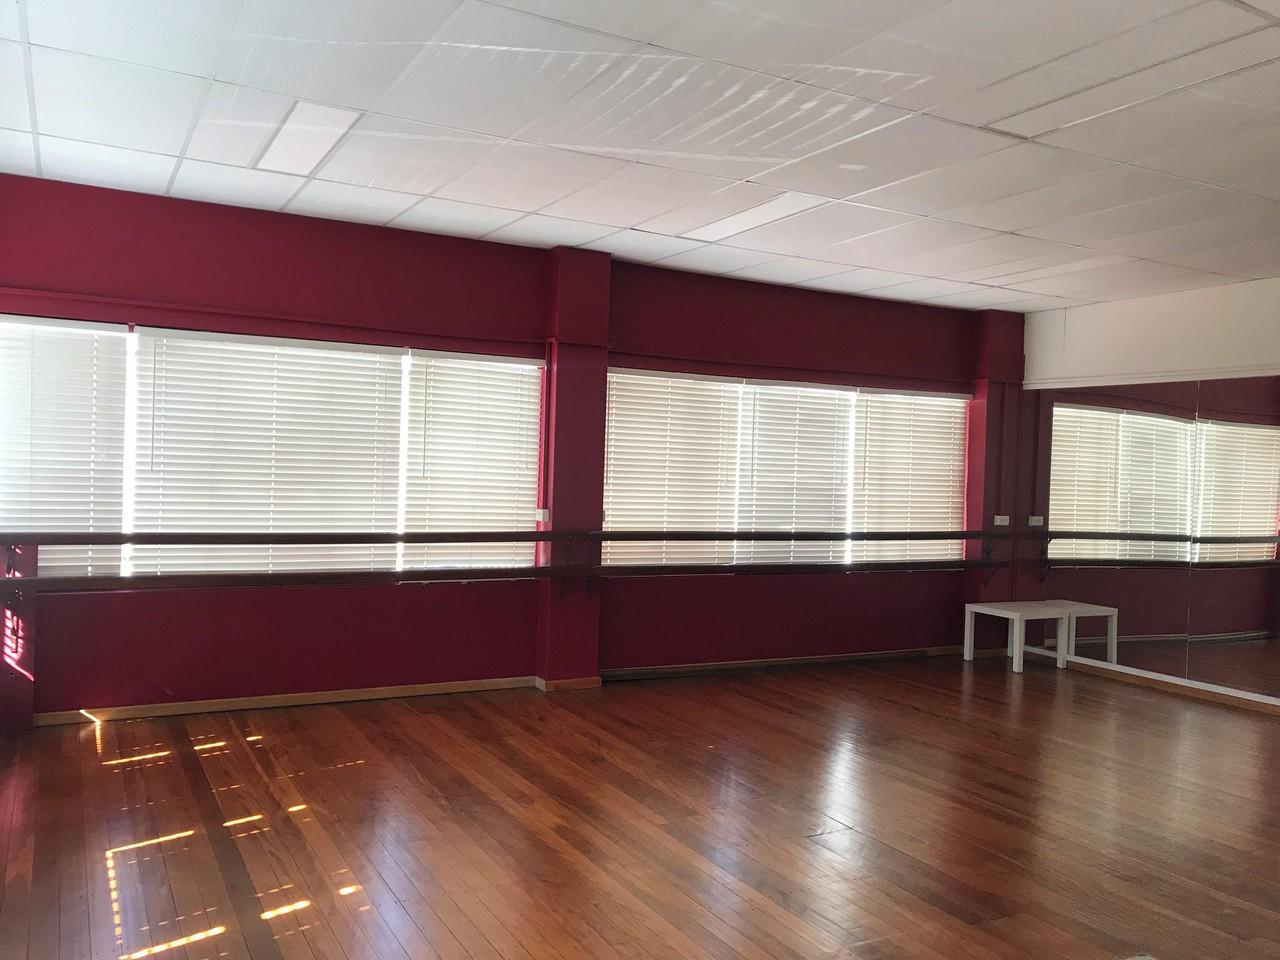 Brisbane  Unusual Maximo Dance Studio - Studio 2 image 1